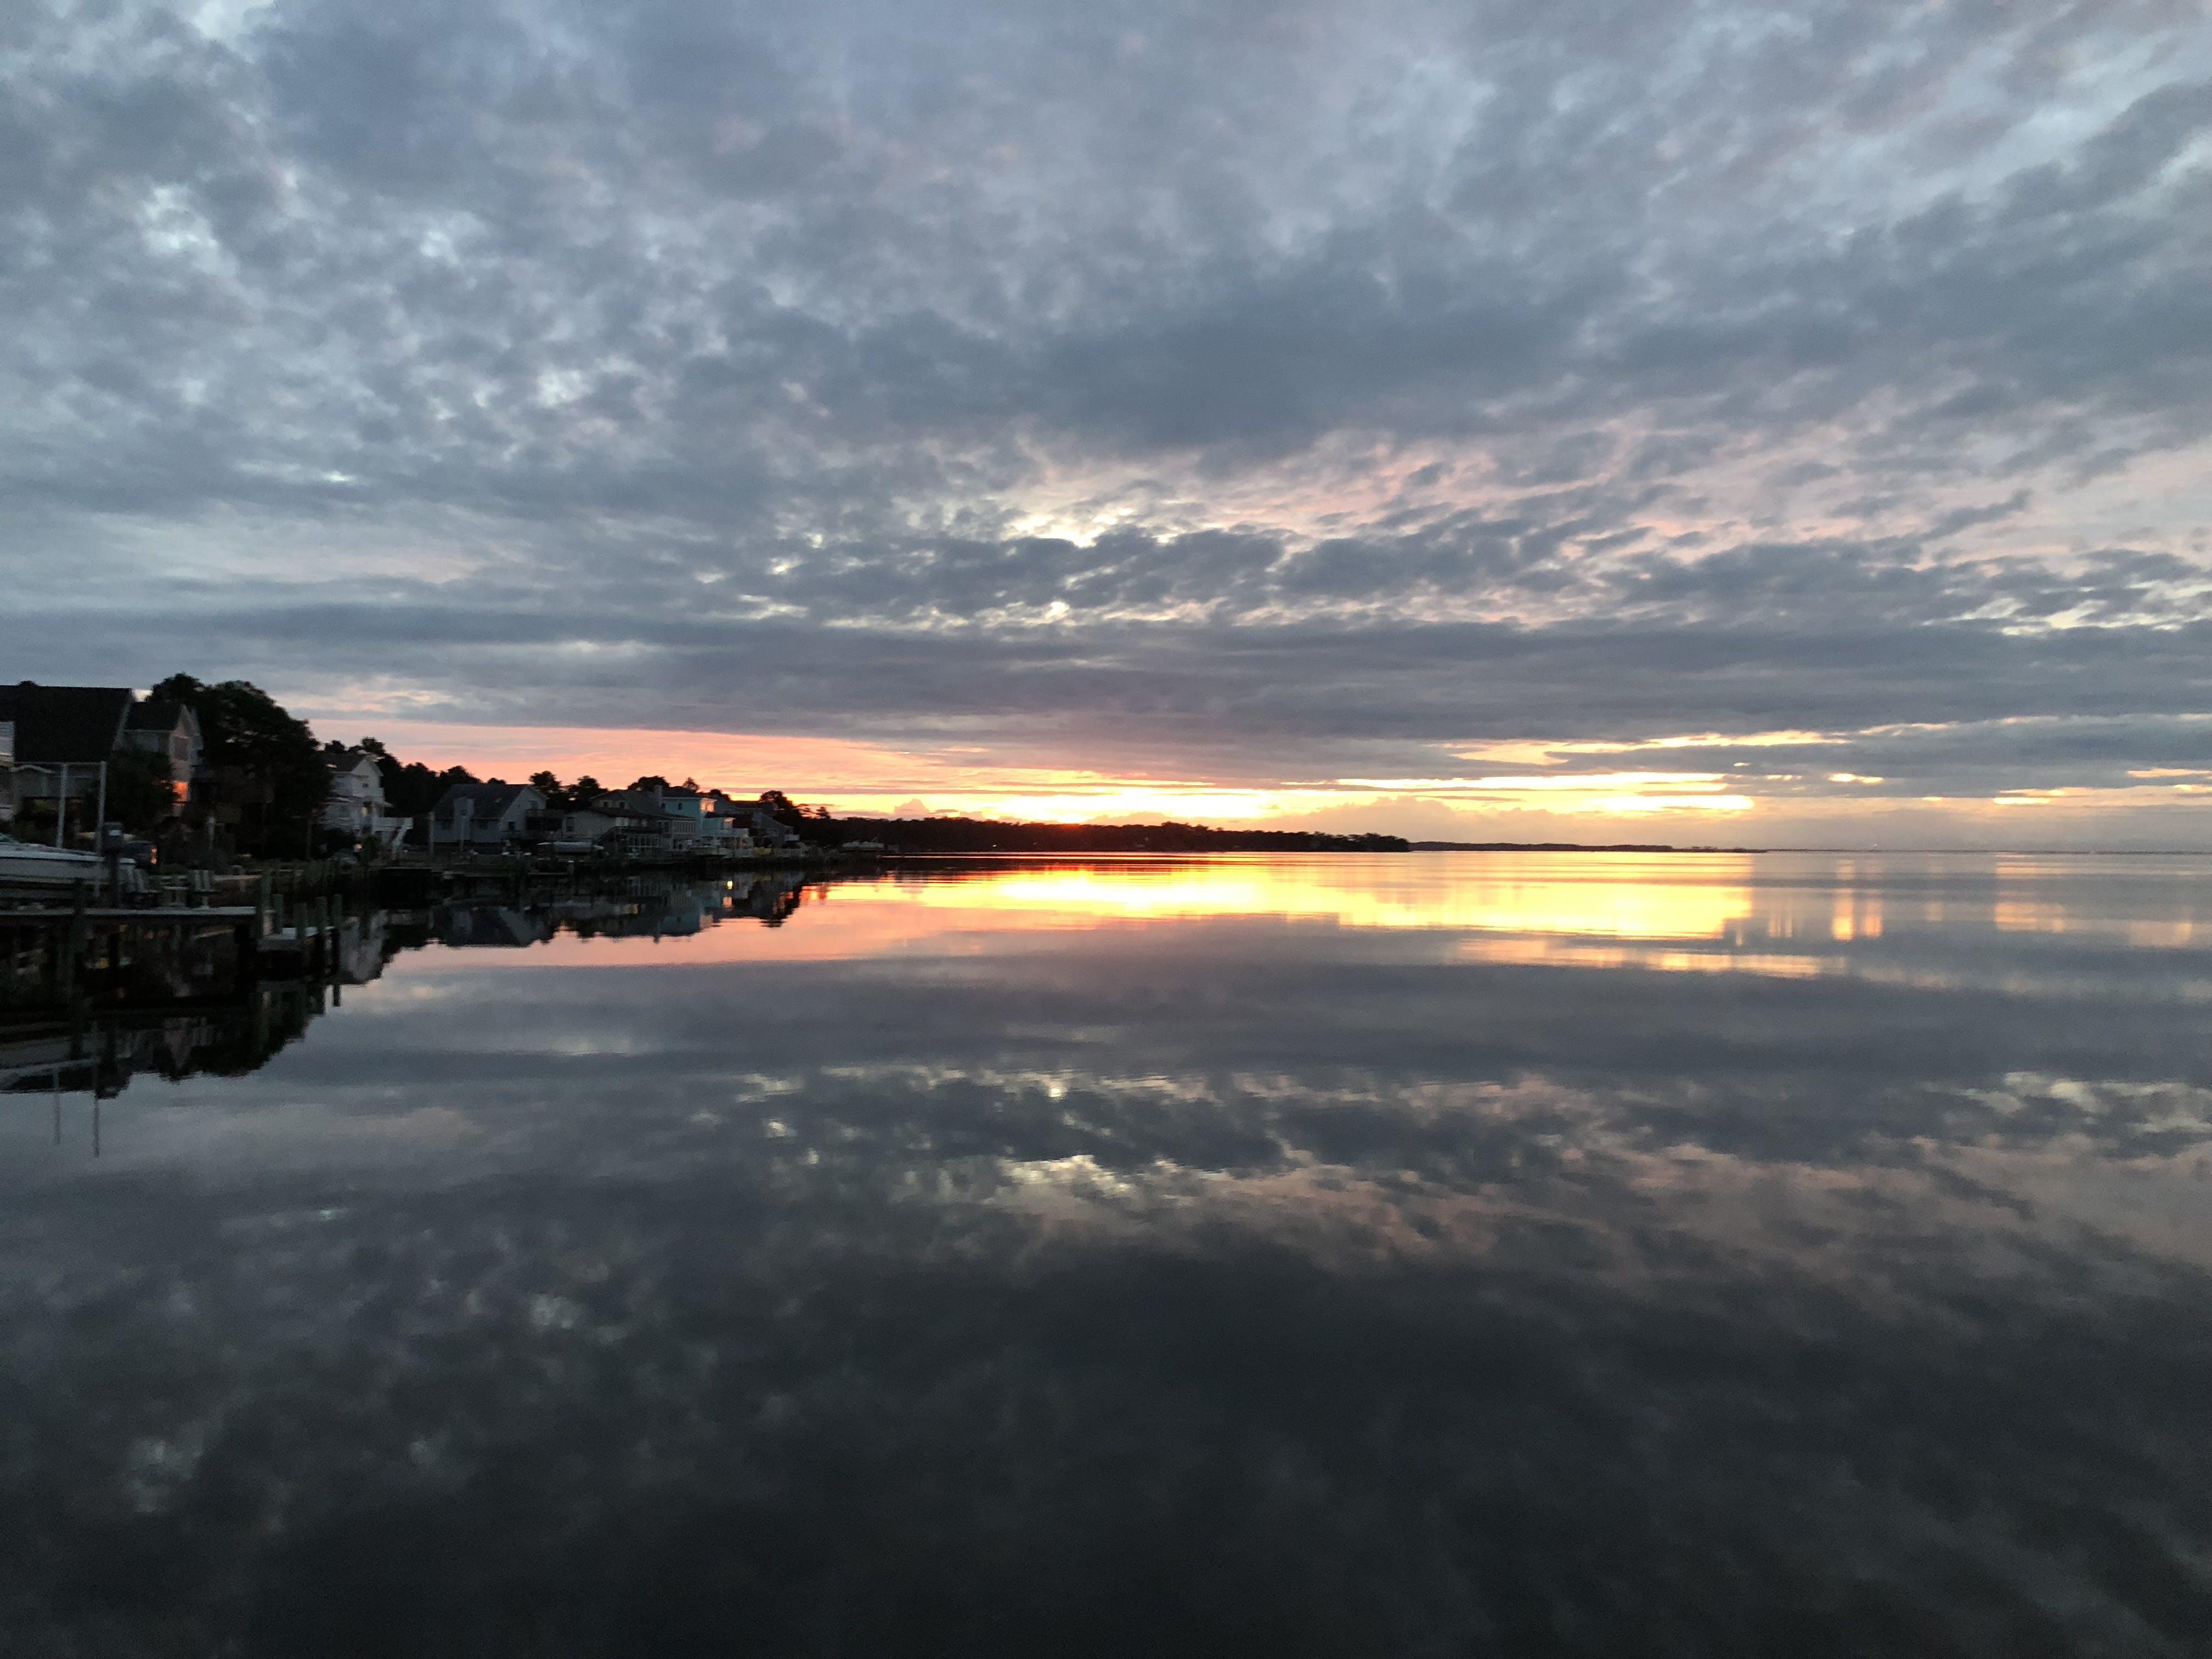 Free stock photo of sunset, reflections, morning sun, evening sun